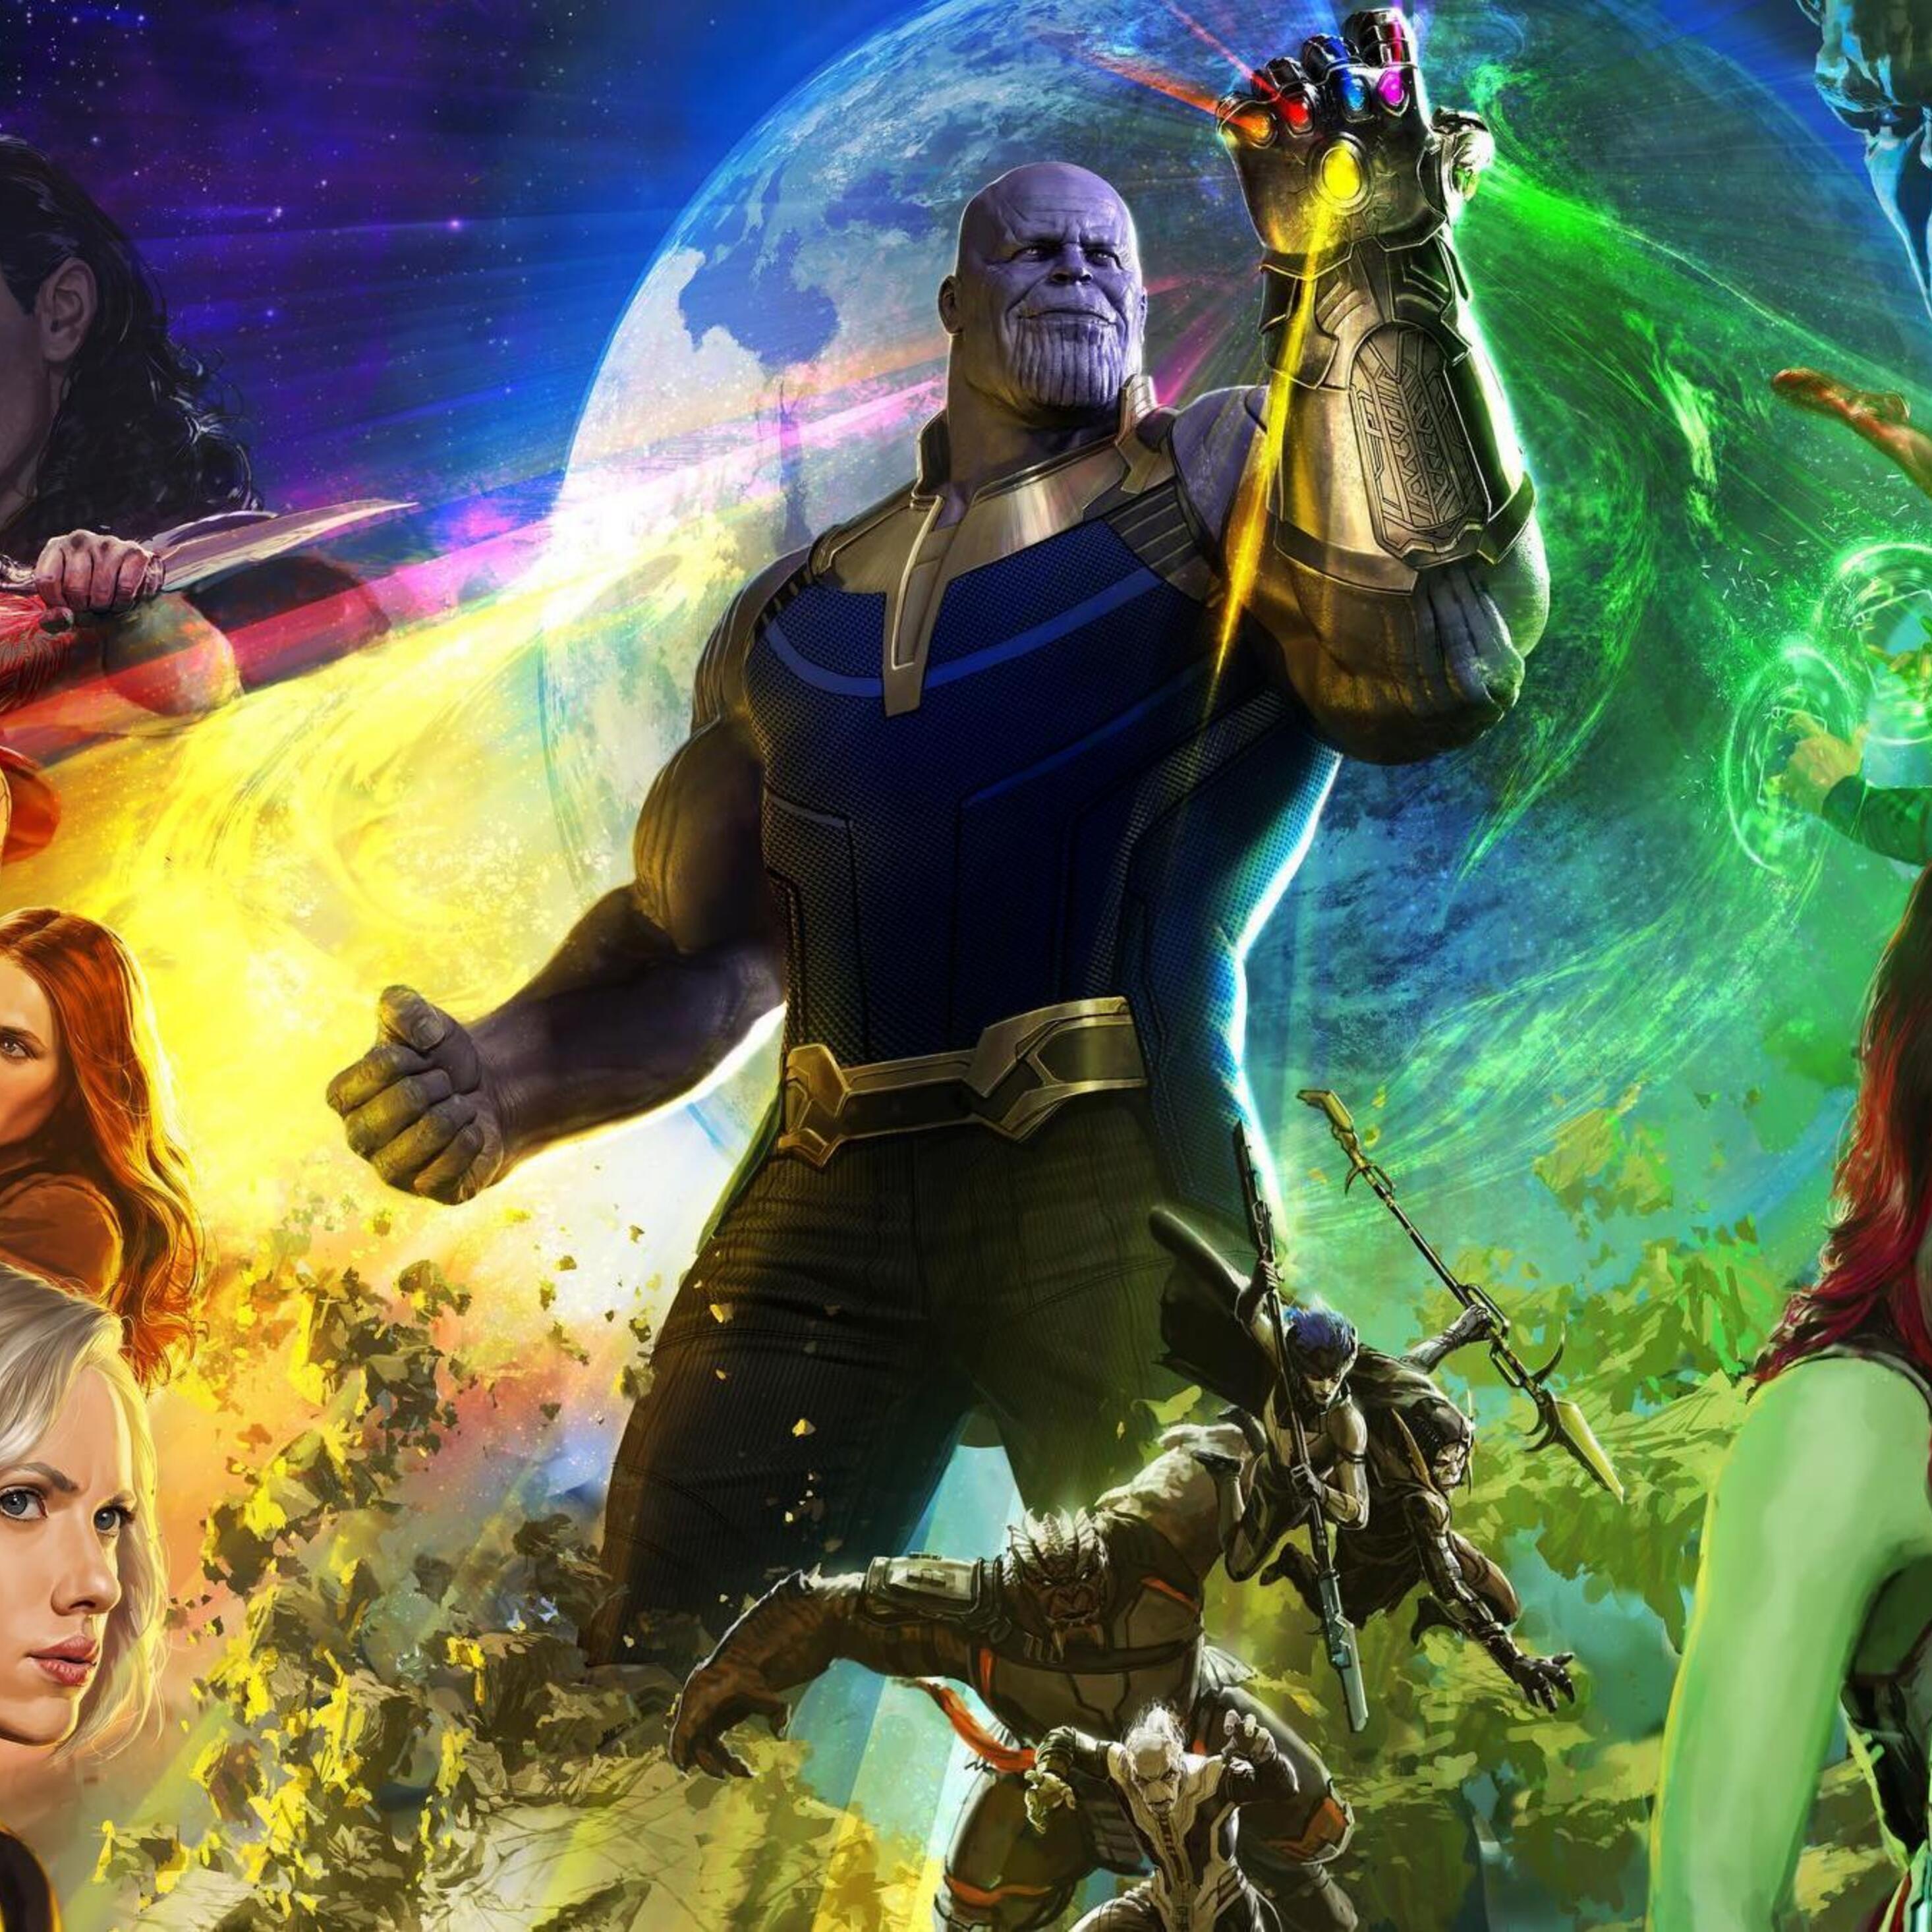 2932x2932 Avengers Infinity War 2018 4k Ipad Pro Retina